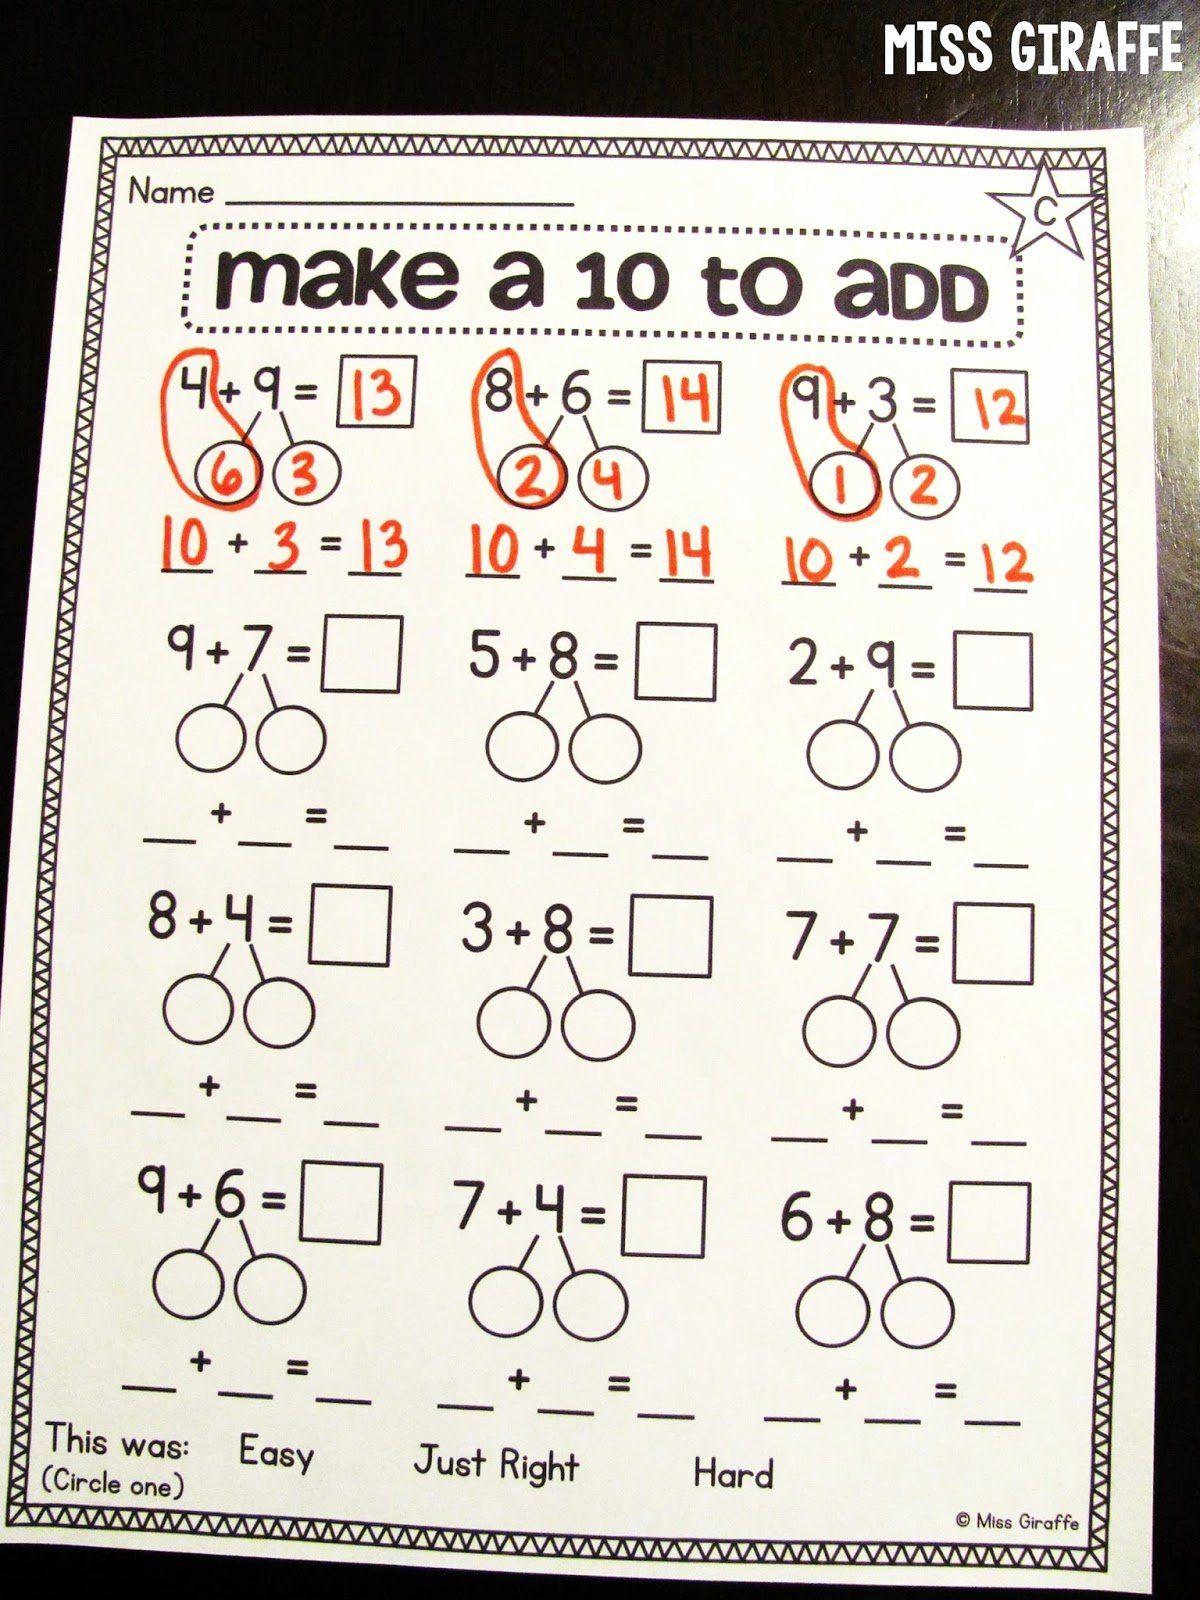 Making Tens Worksheet 2nd Grade Unique Miss Giraffe S